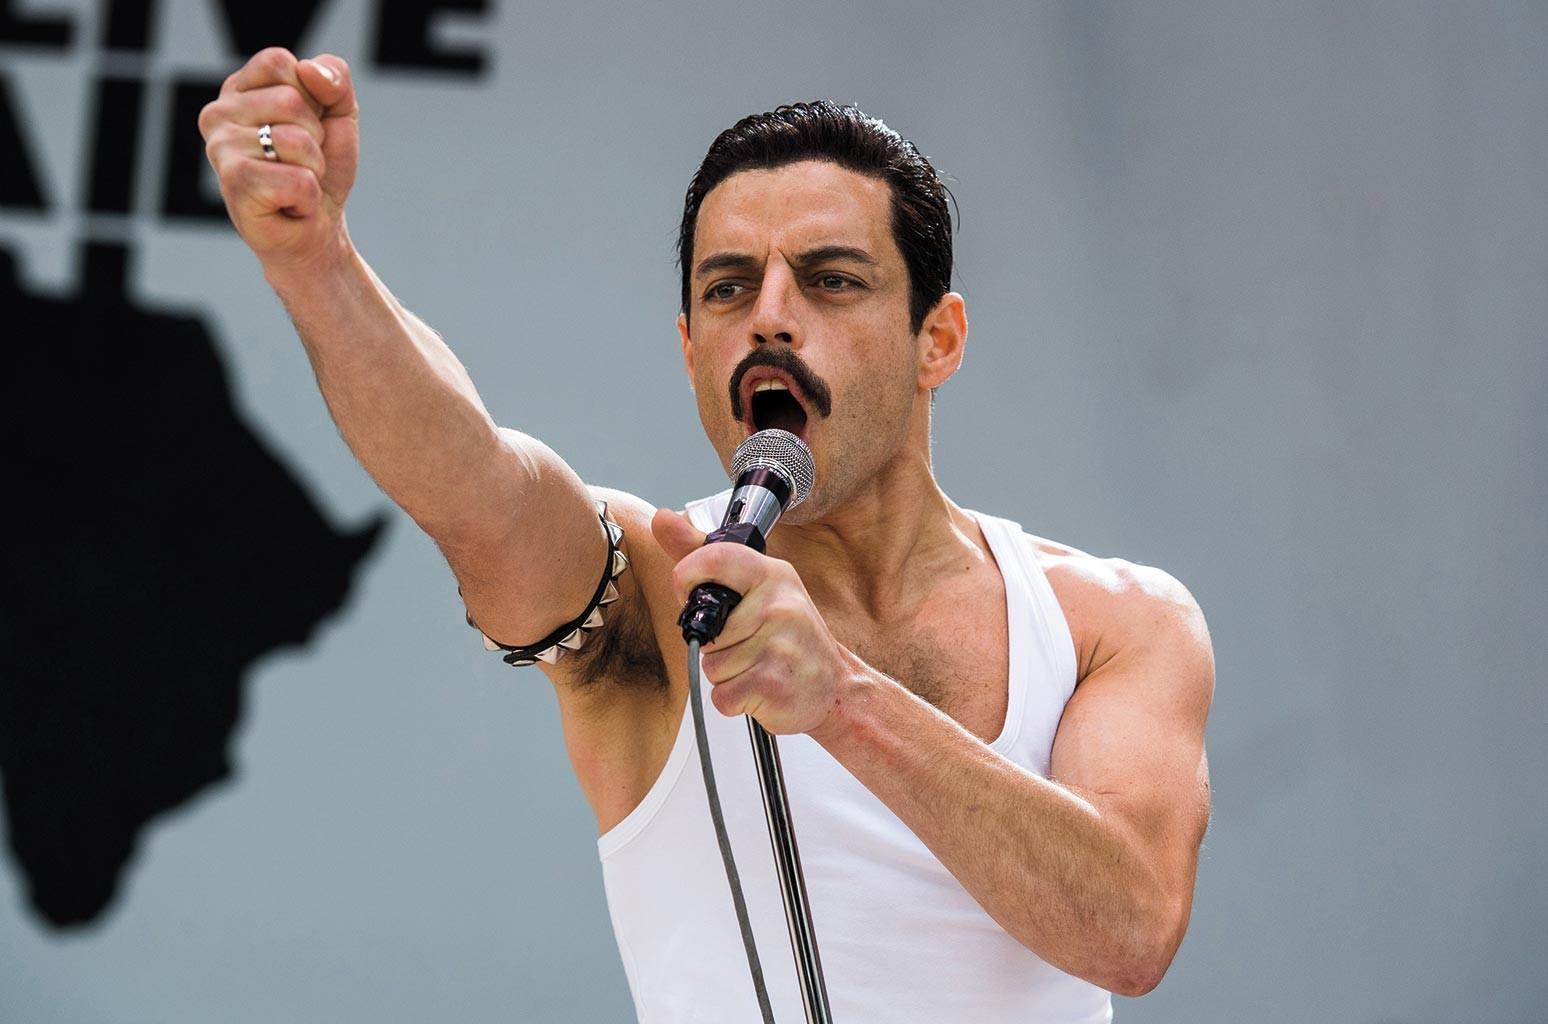 Rami Malek stars as Freddie Mercury